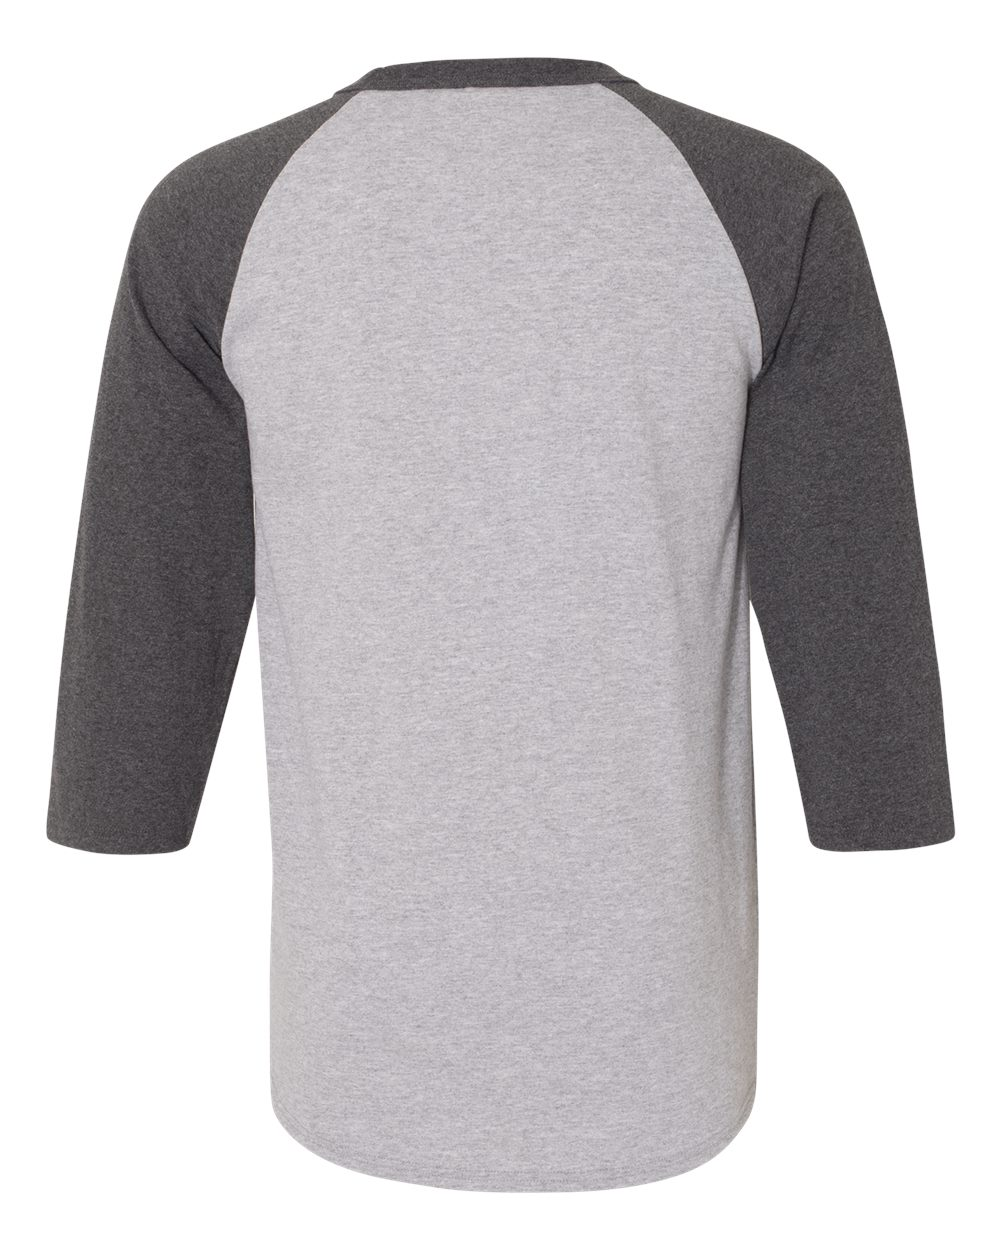 ce95b0c0 Champion Men's 5.2 oz. Raglan Baseball T-Shirt T1397 S-3XL   eBay